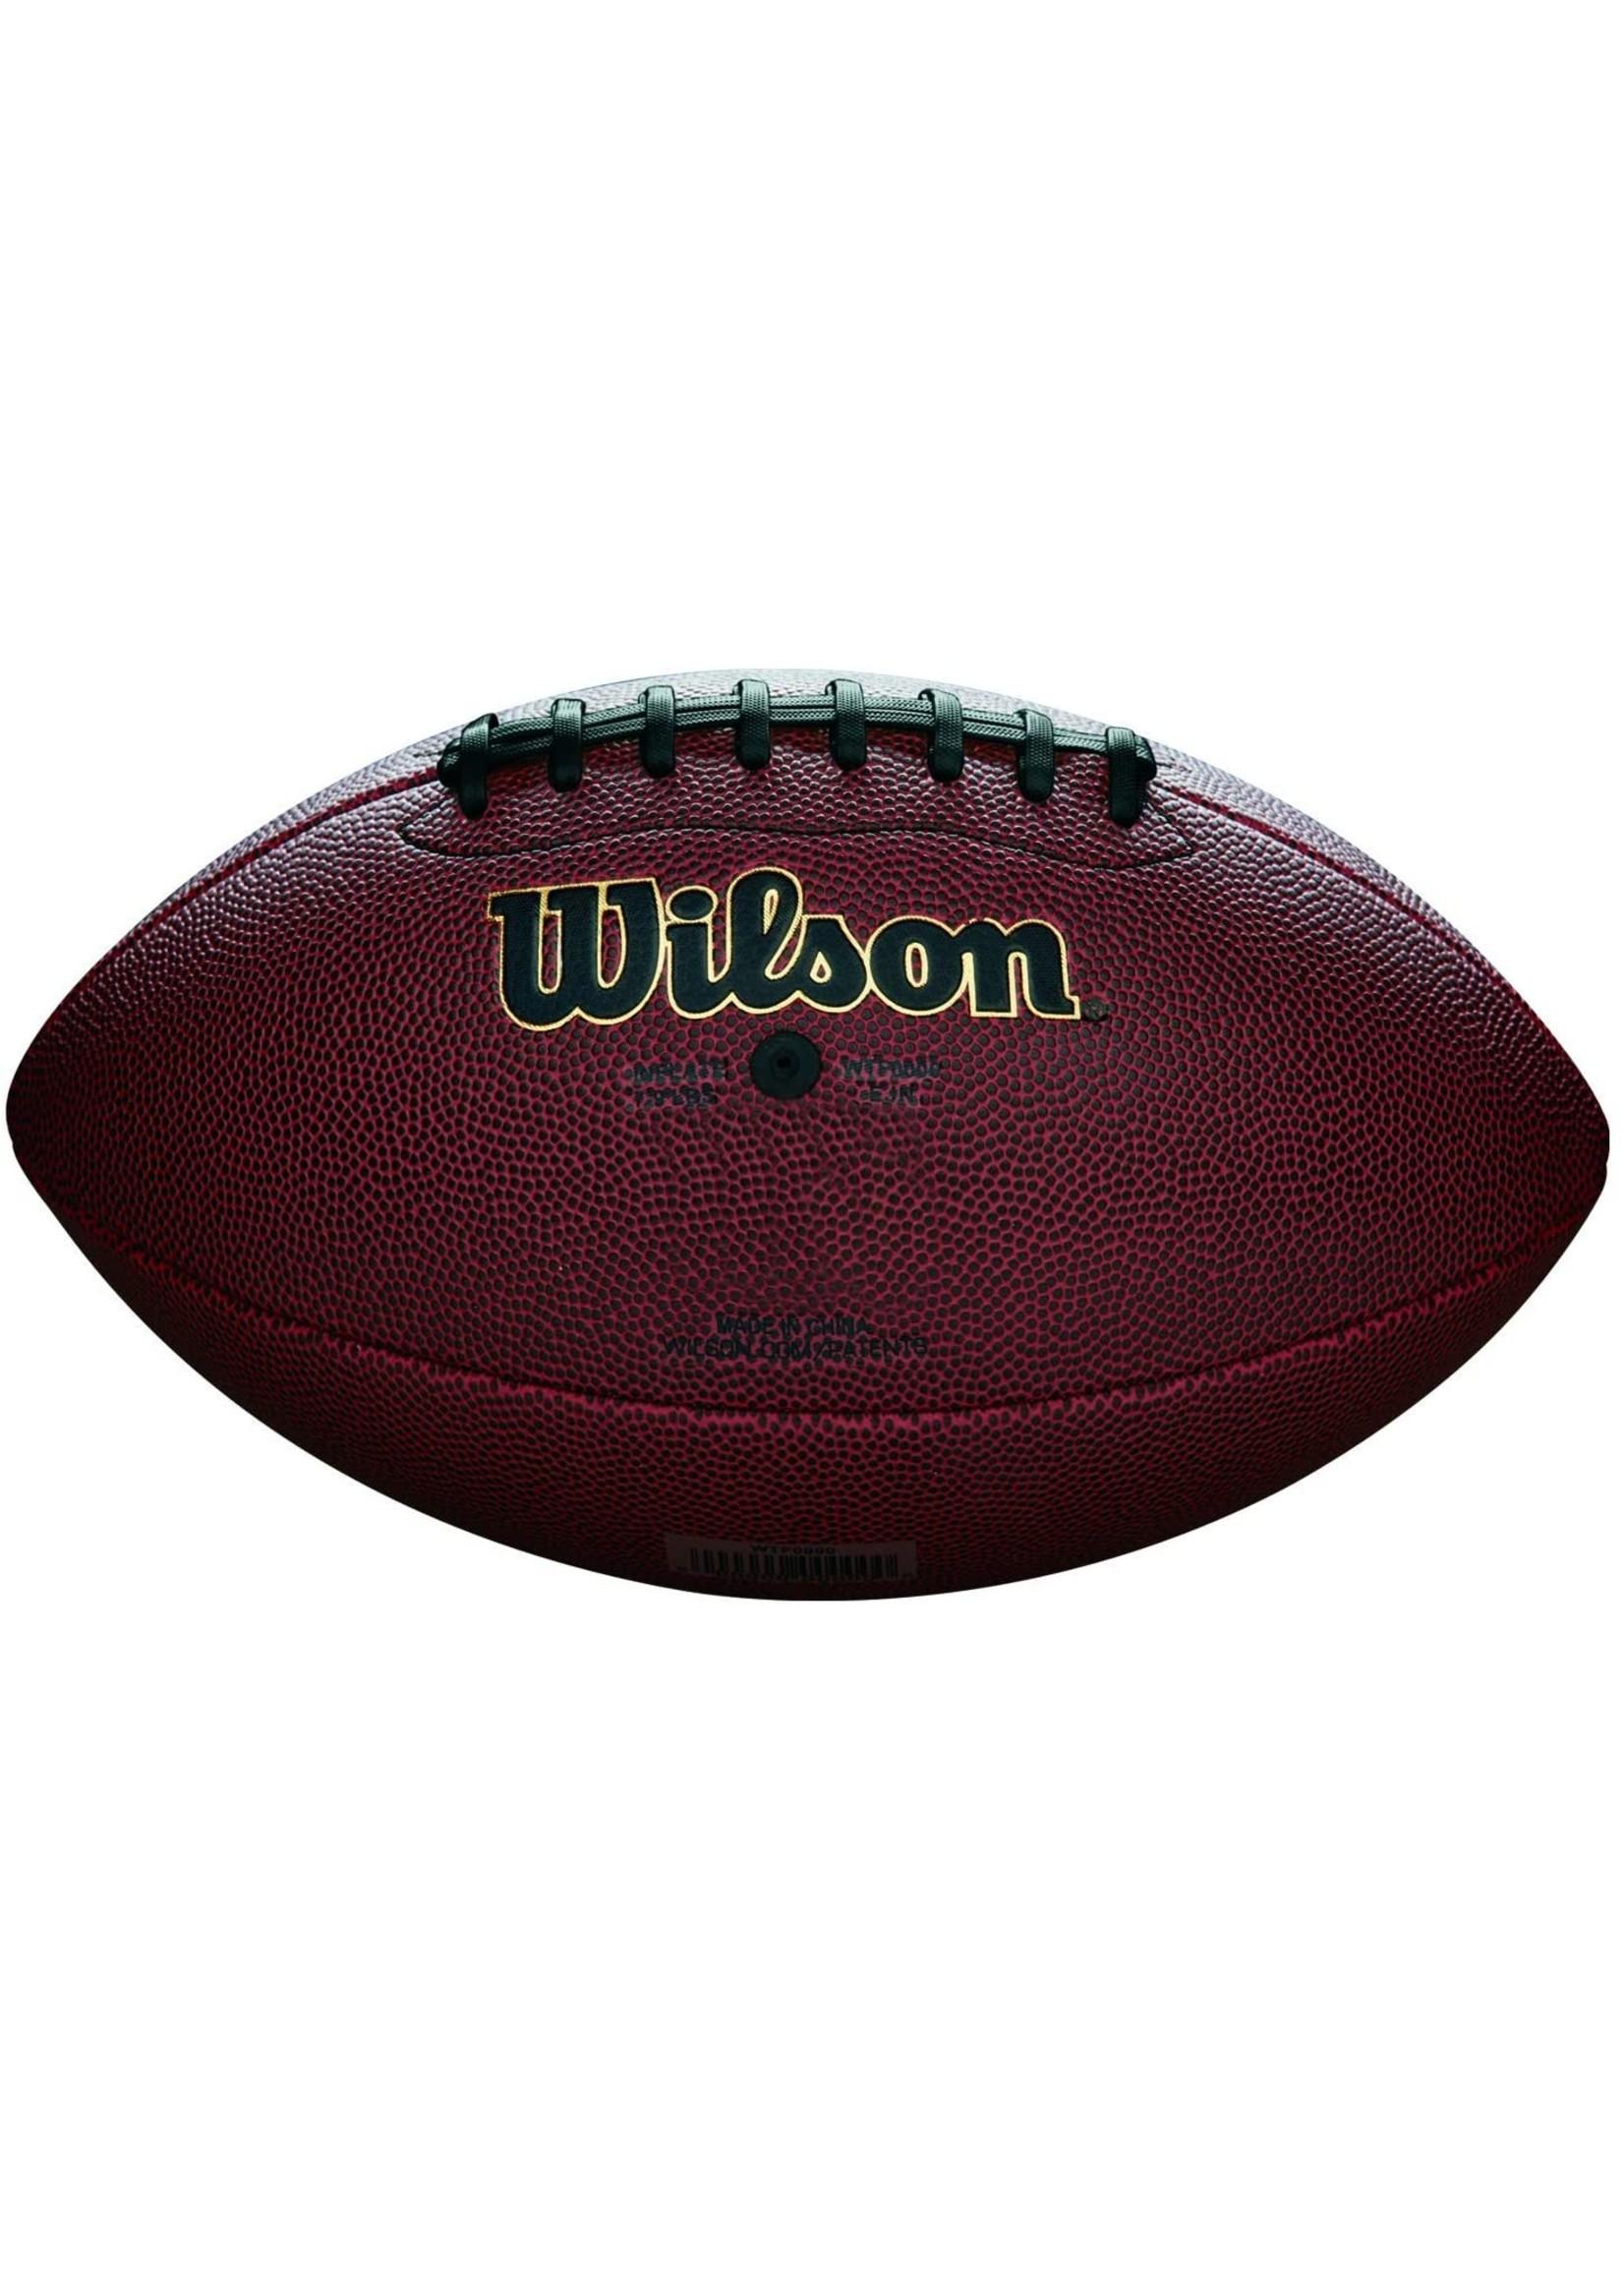 WILSON WILSON FOOTBALL THE ICON JR SIZE